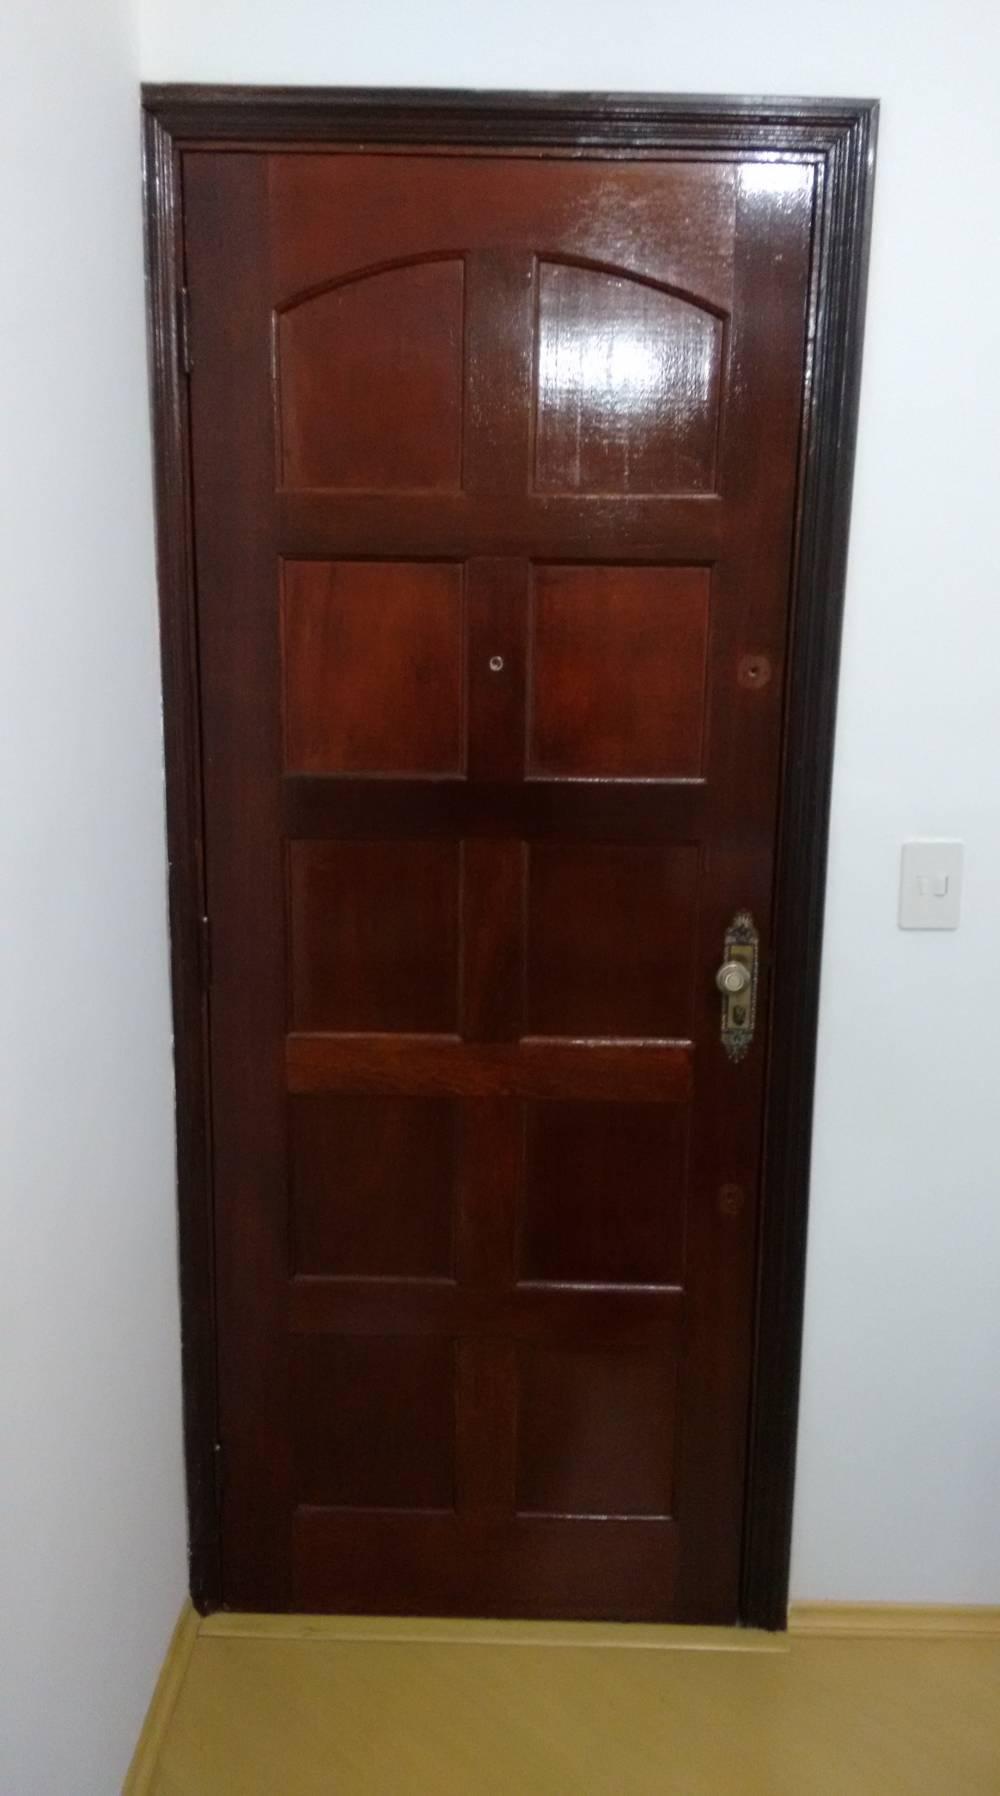 Serviços de Pequenos Reparos Residenciais no Jardim dos Bandeirantes - Reparo Residencial